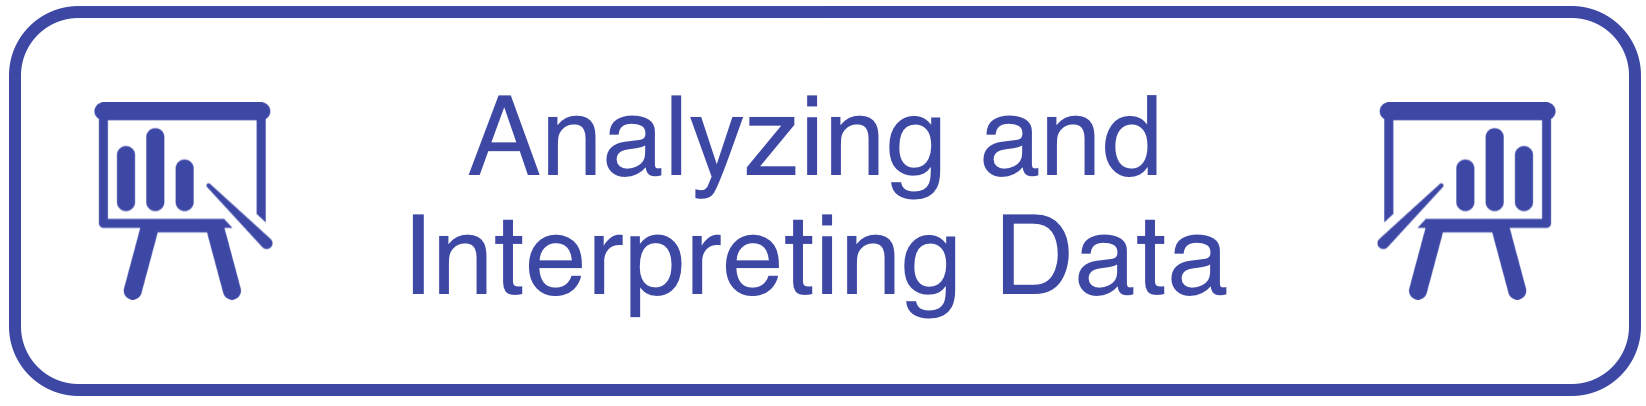 Analyzing_and_Interpreting_Data.png